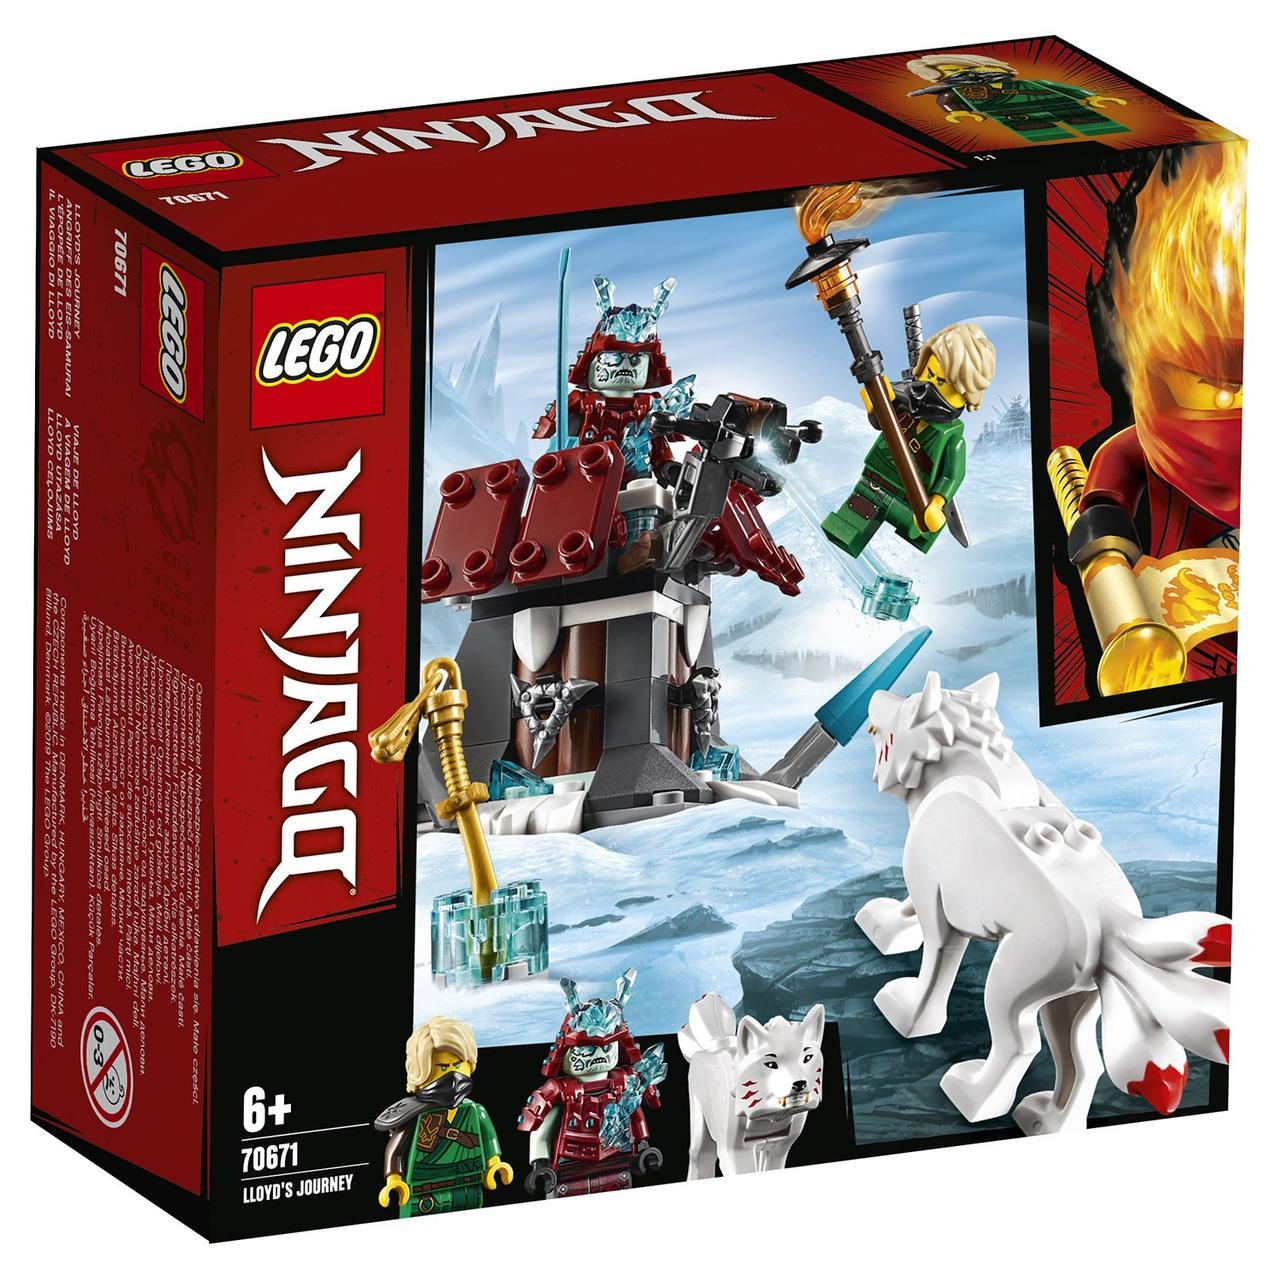 70671 Lego Ninjago Путешествие Ллойда, Лего Ниндзяго